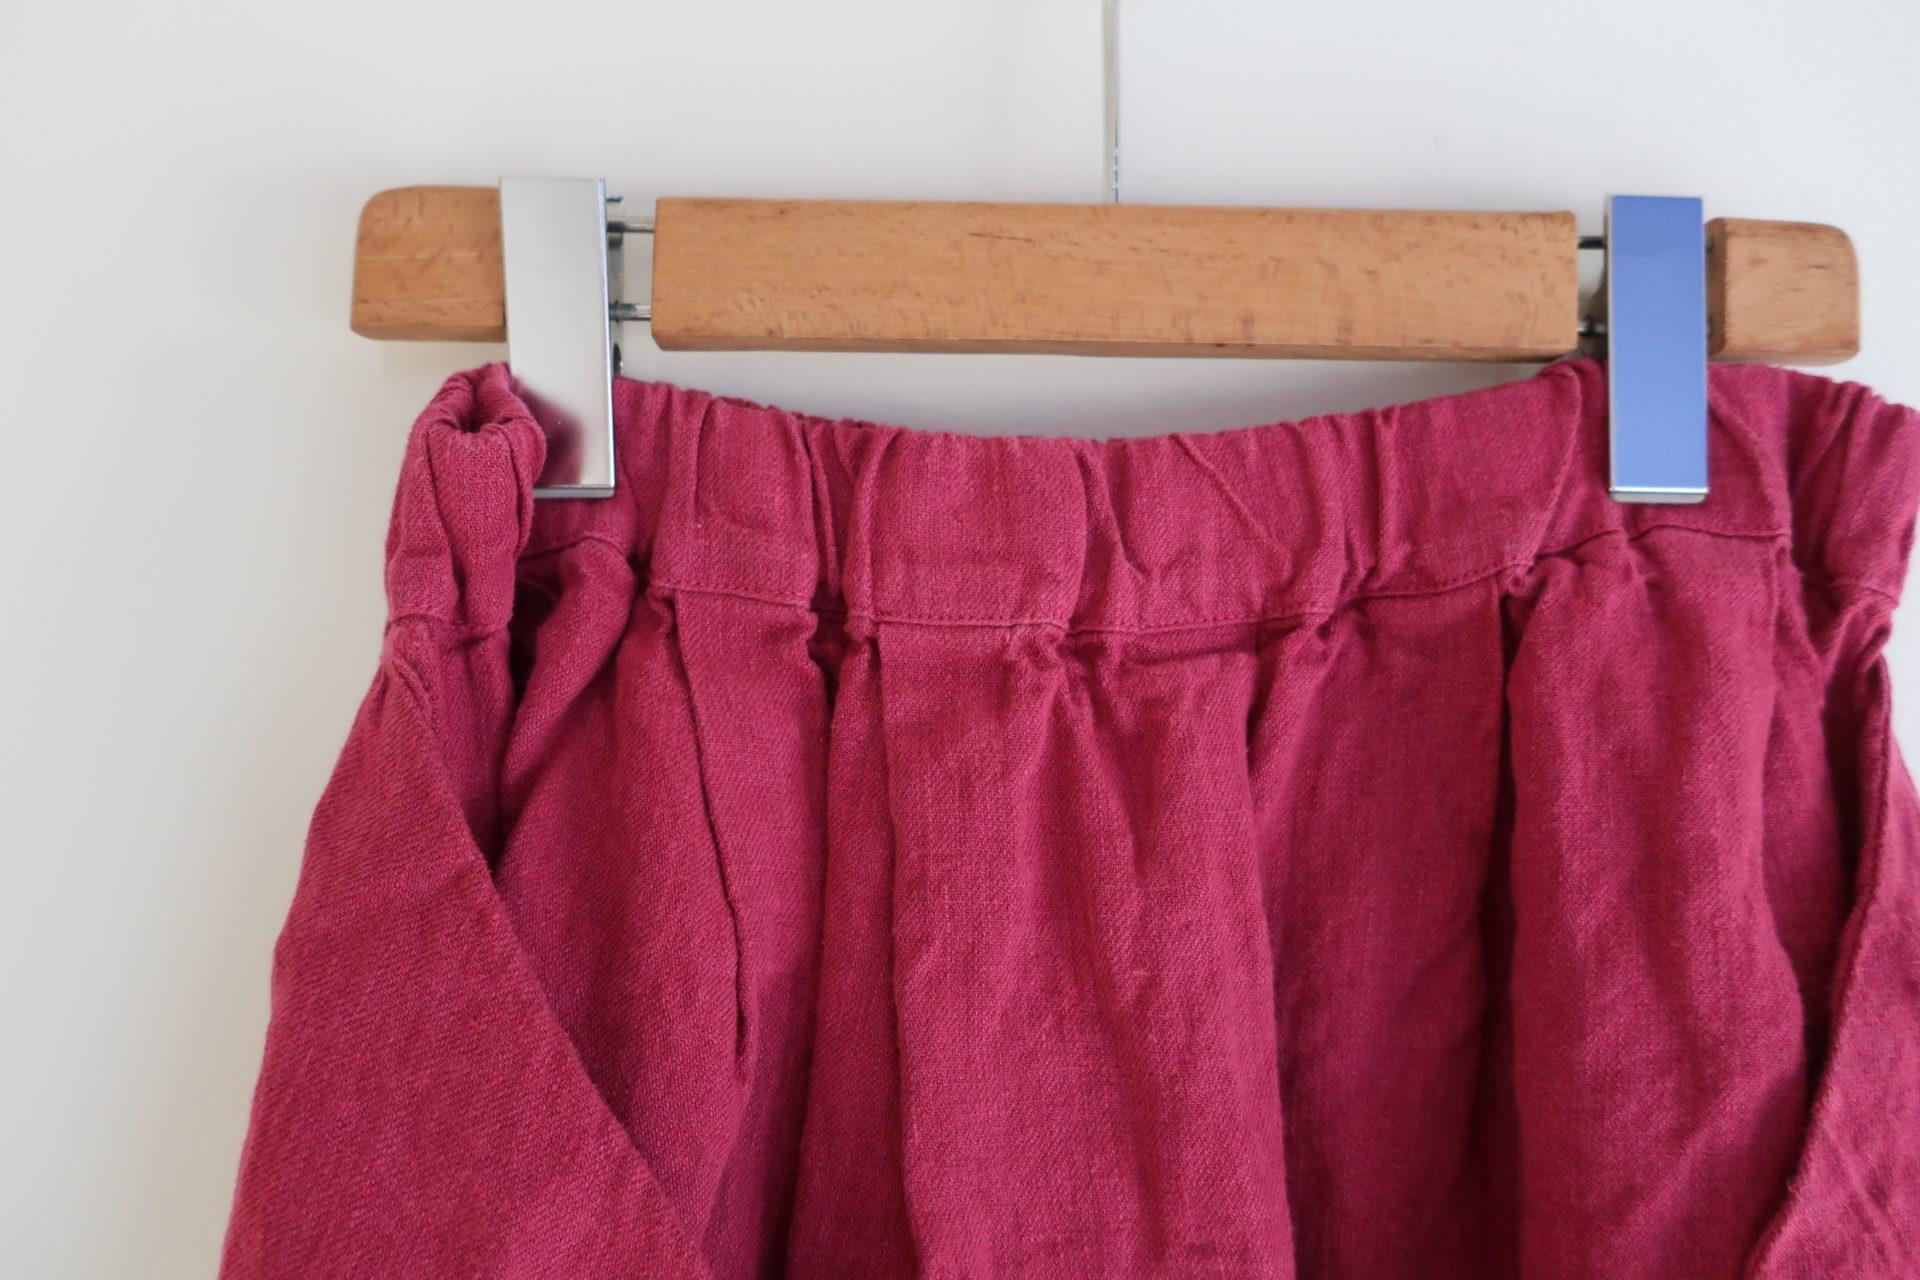 tumugu: ソリトリネンマルチwayスカート(sold out)